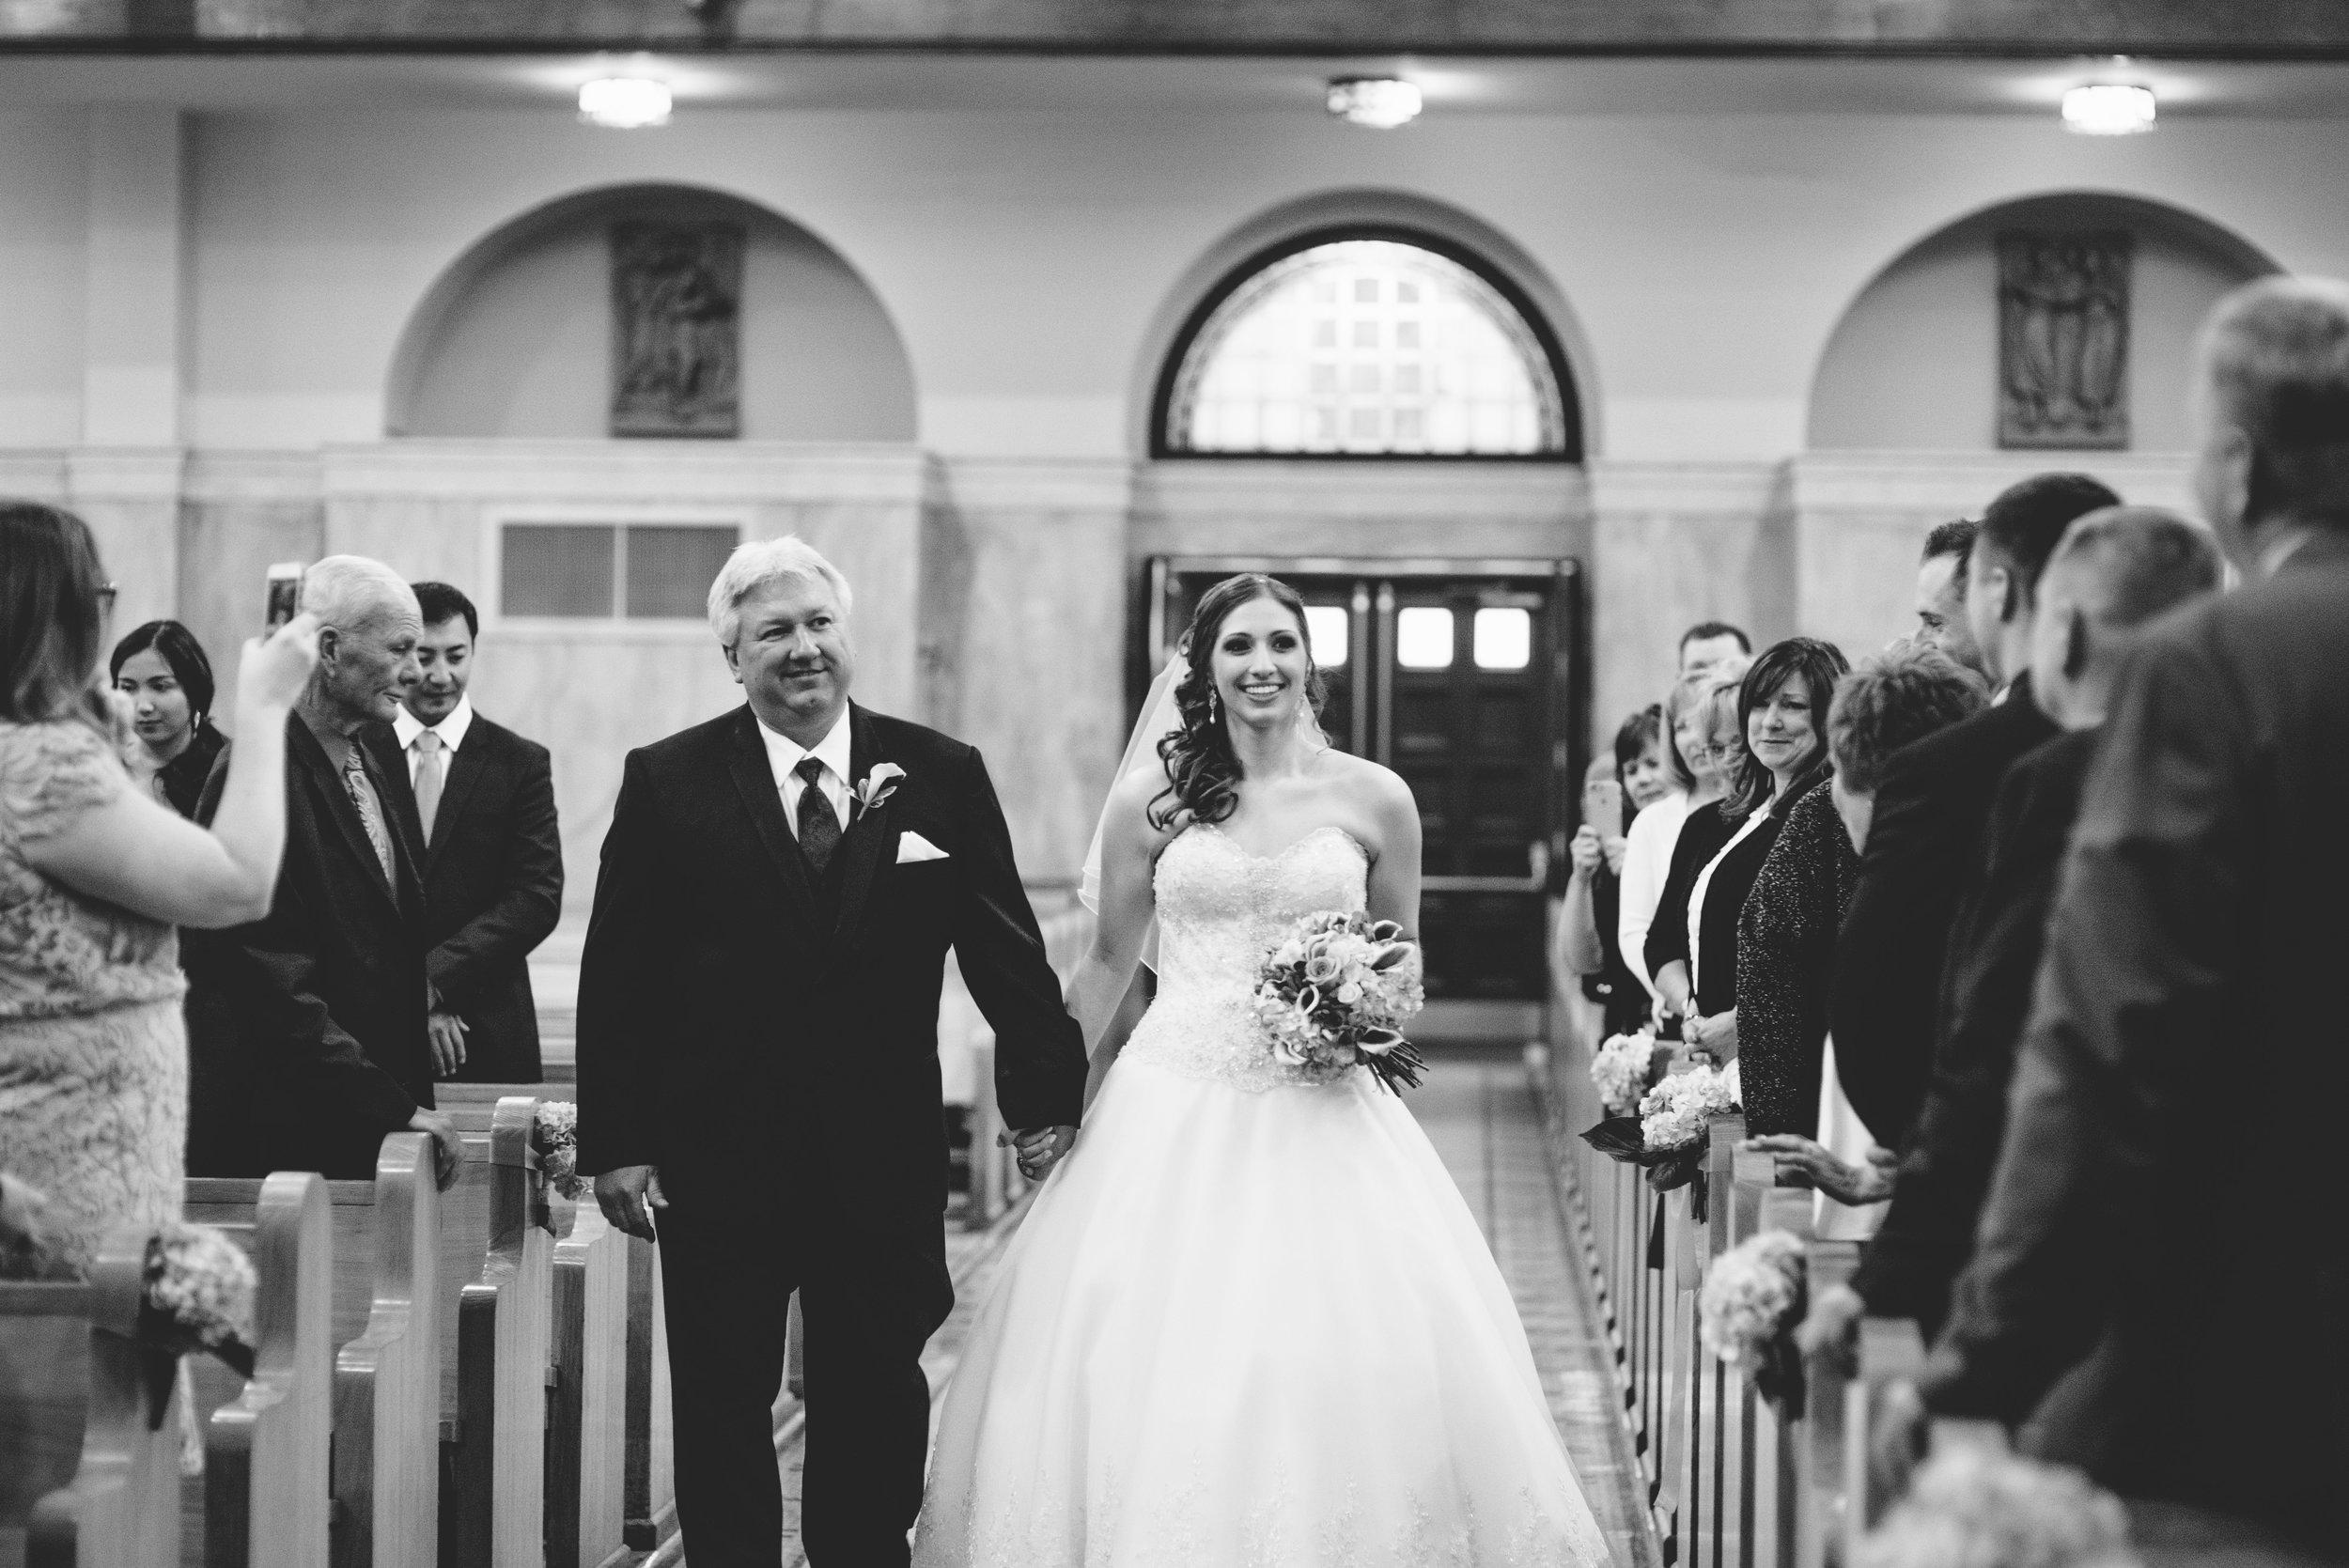 Wedding ceremony aisle // The Miner Details weddings